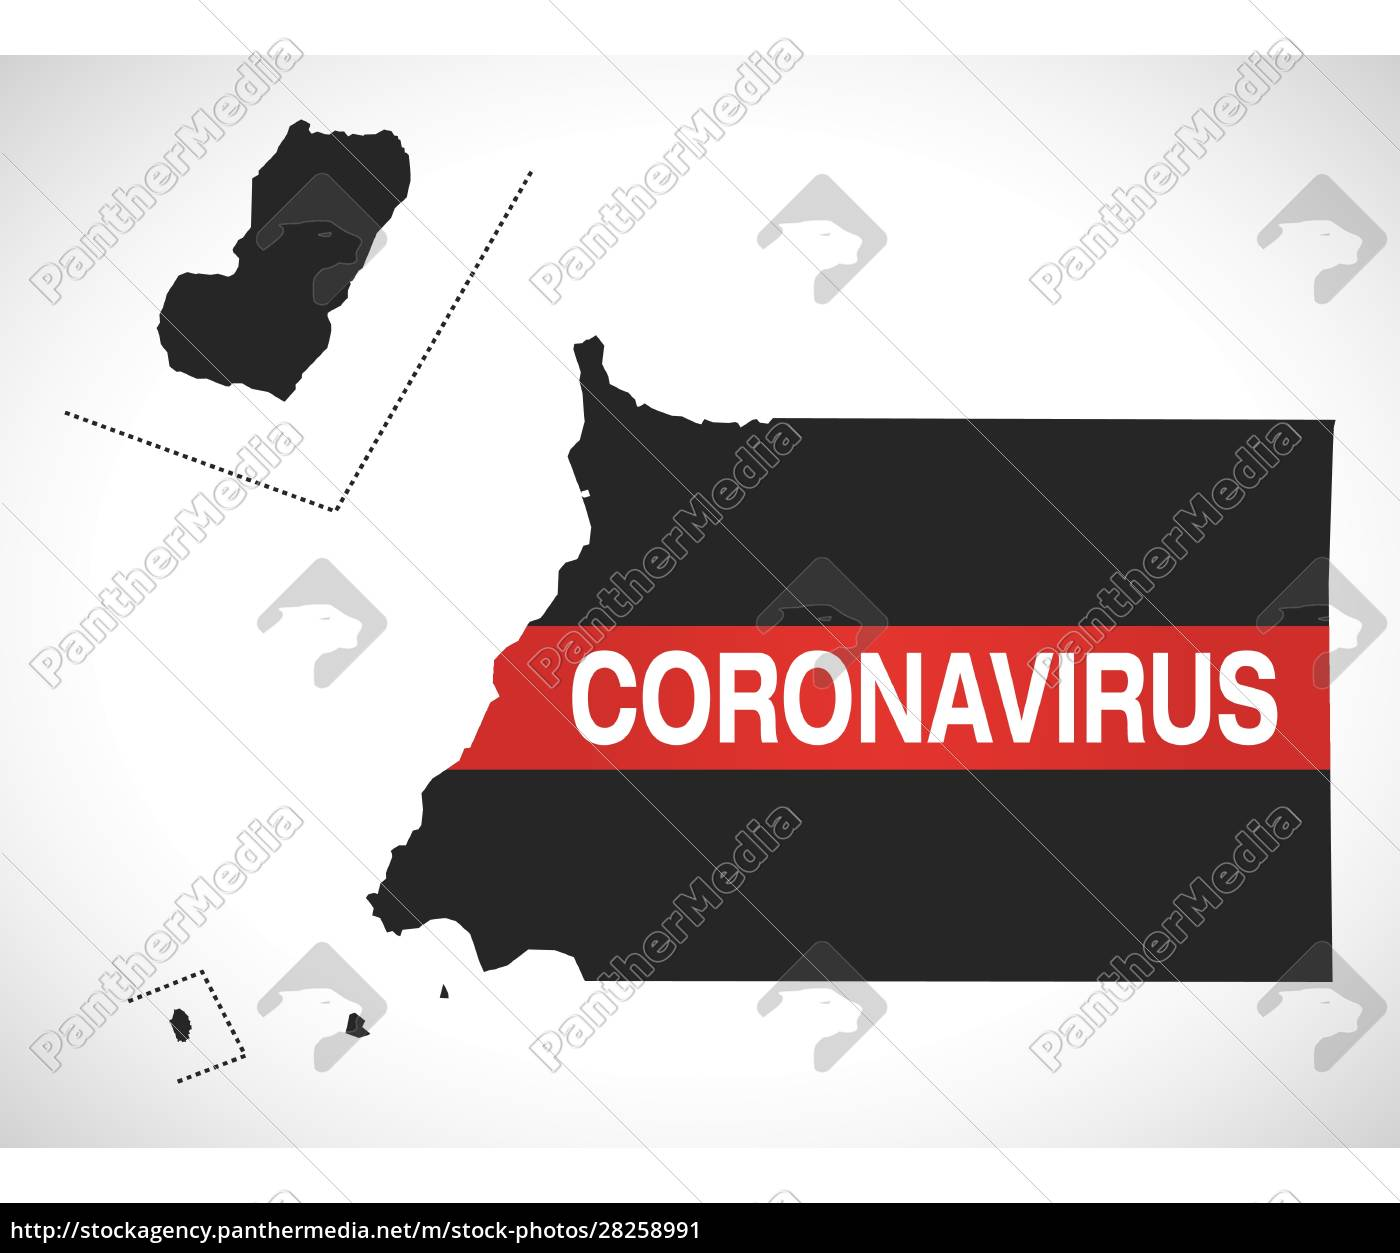 equatorial, guinea, map, with, coronavirus, warning - 28258991